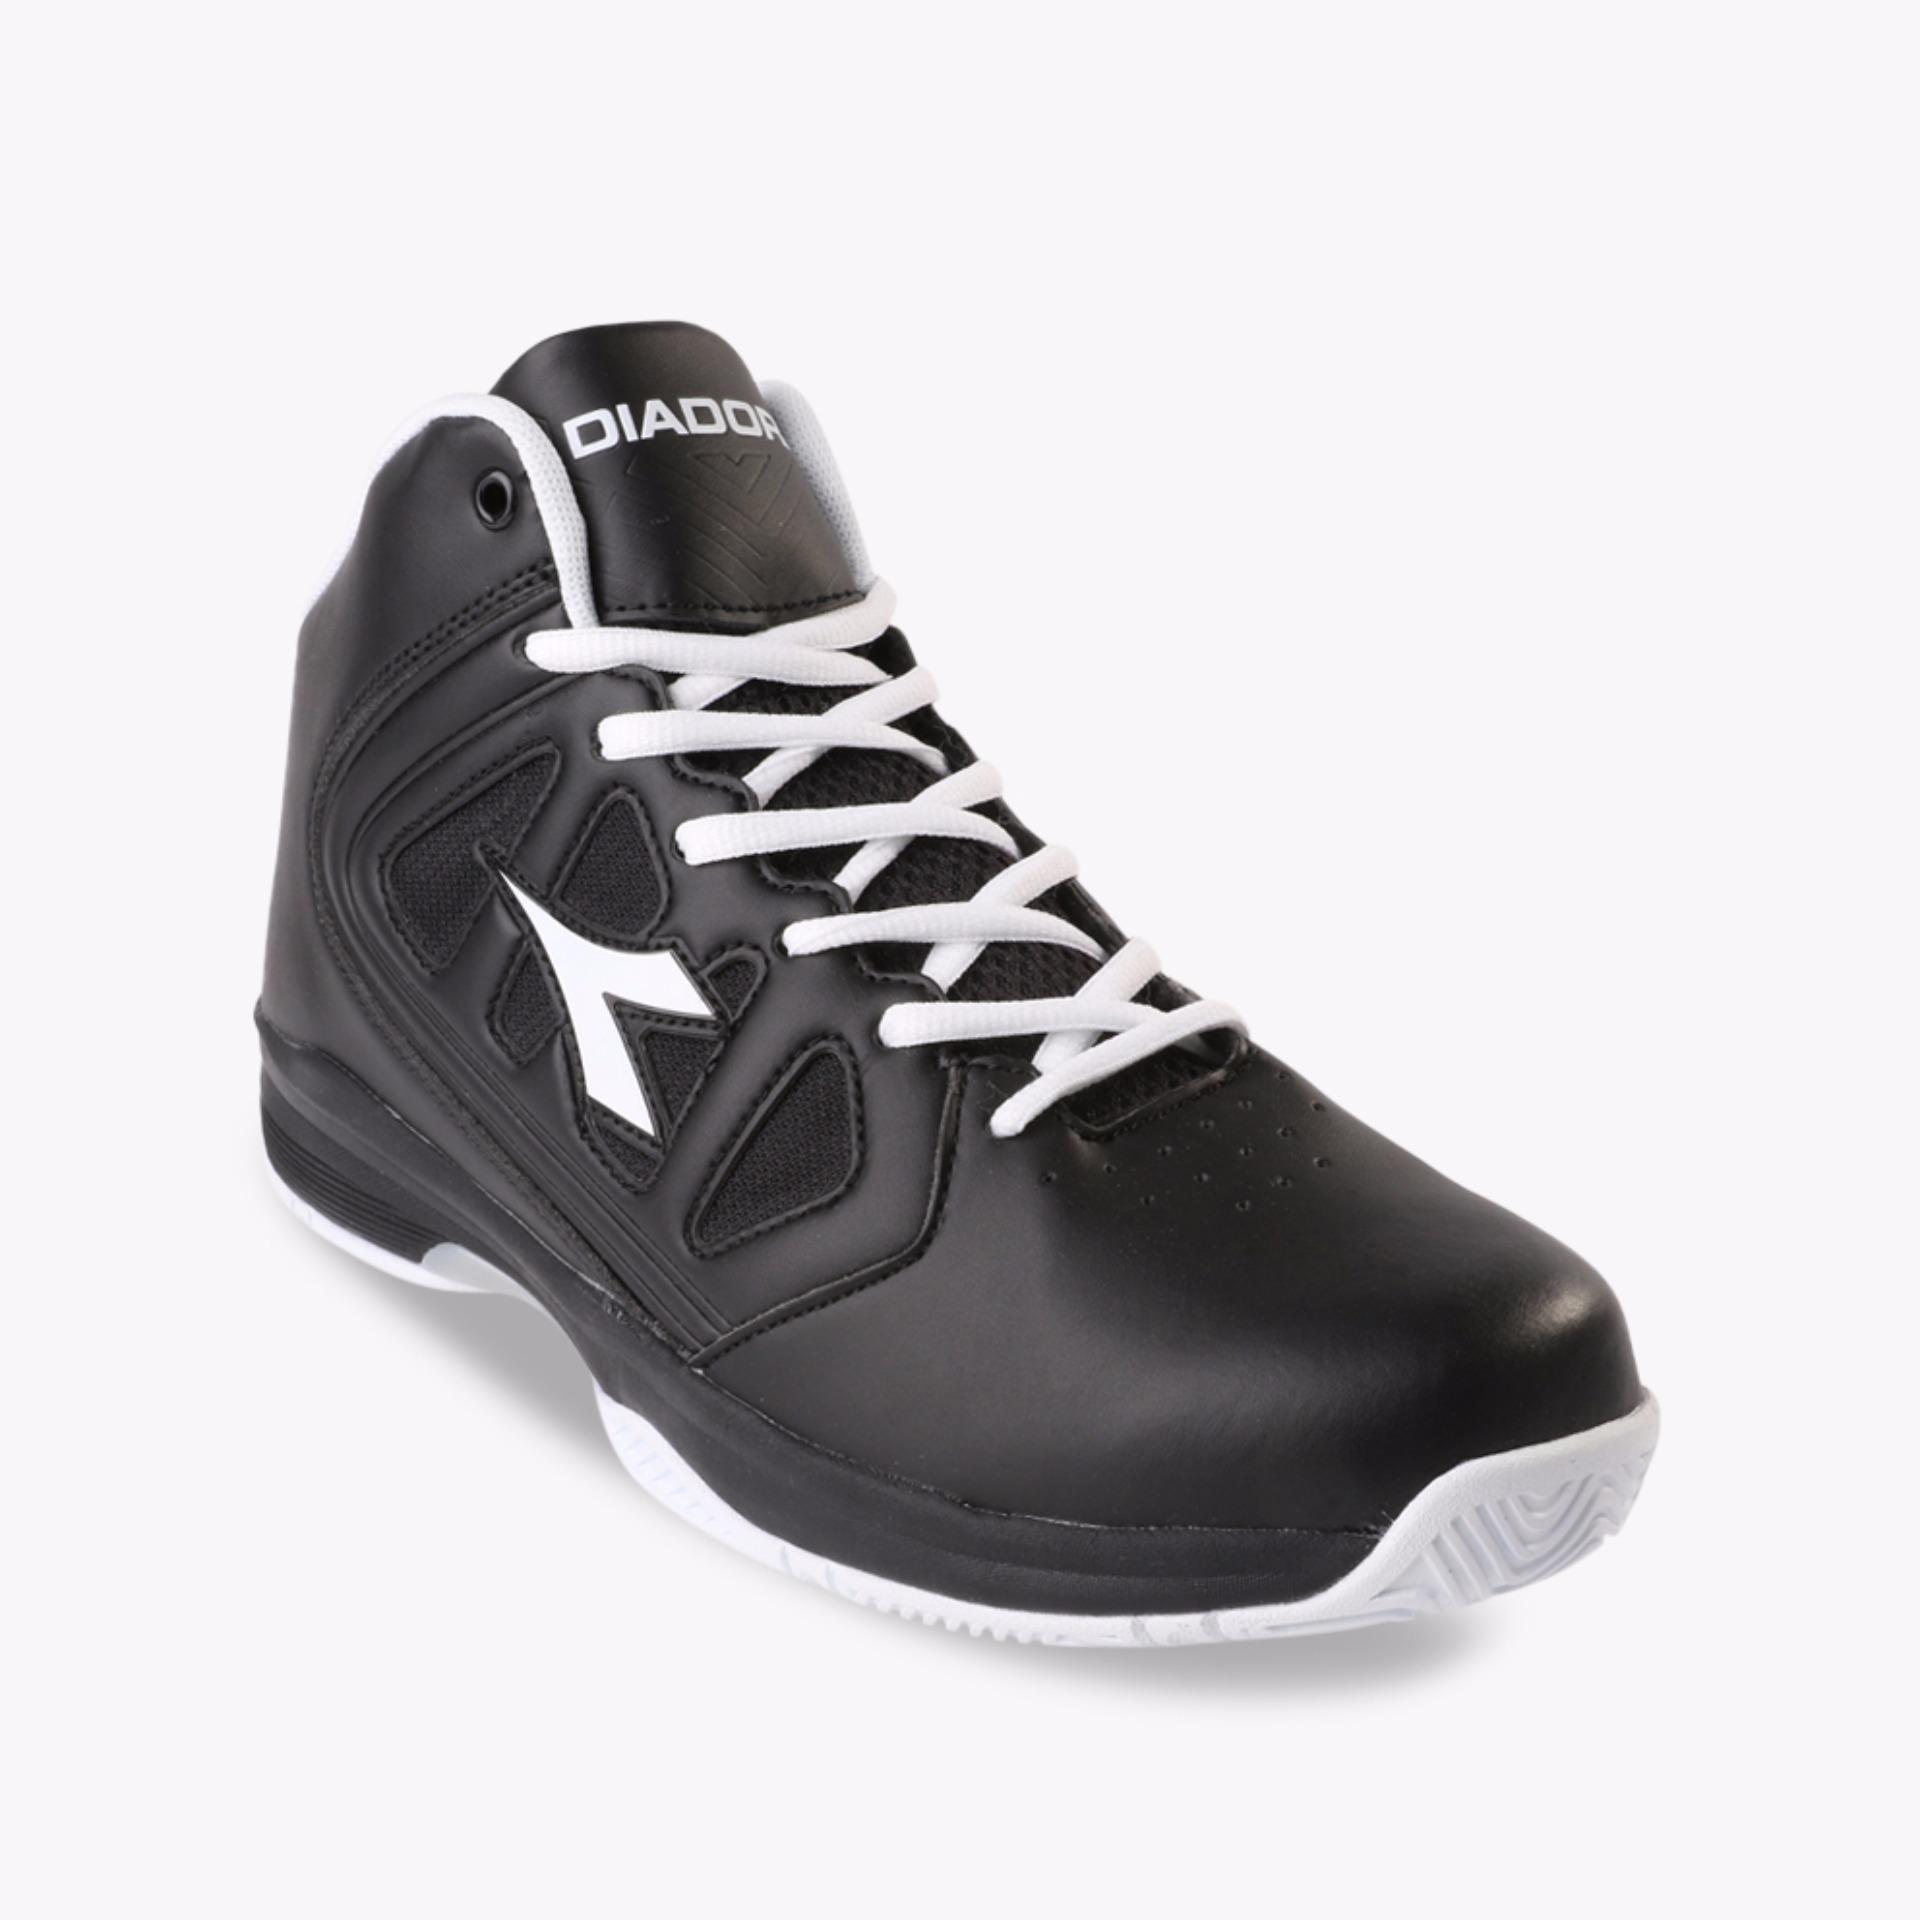 Perbandingan Harga Diadora Guard Men S Basketball Shoes Hitam Di Indonesia